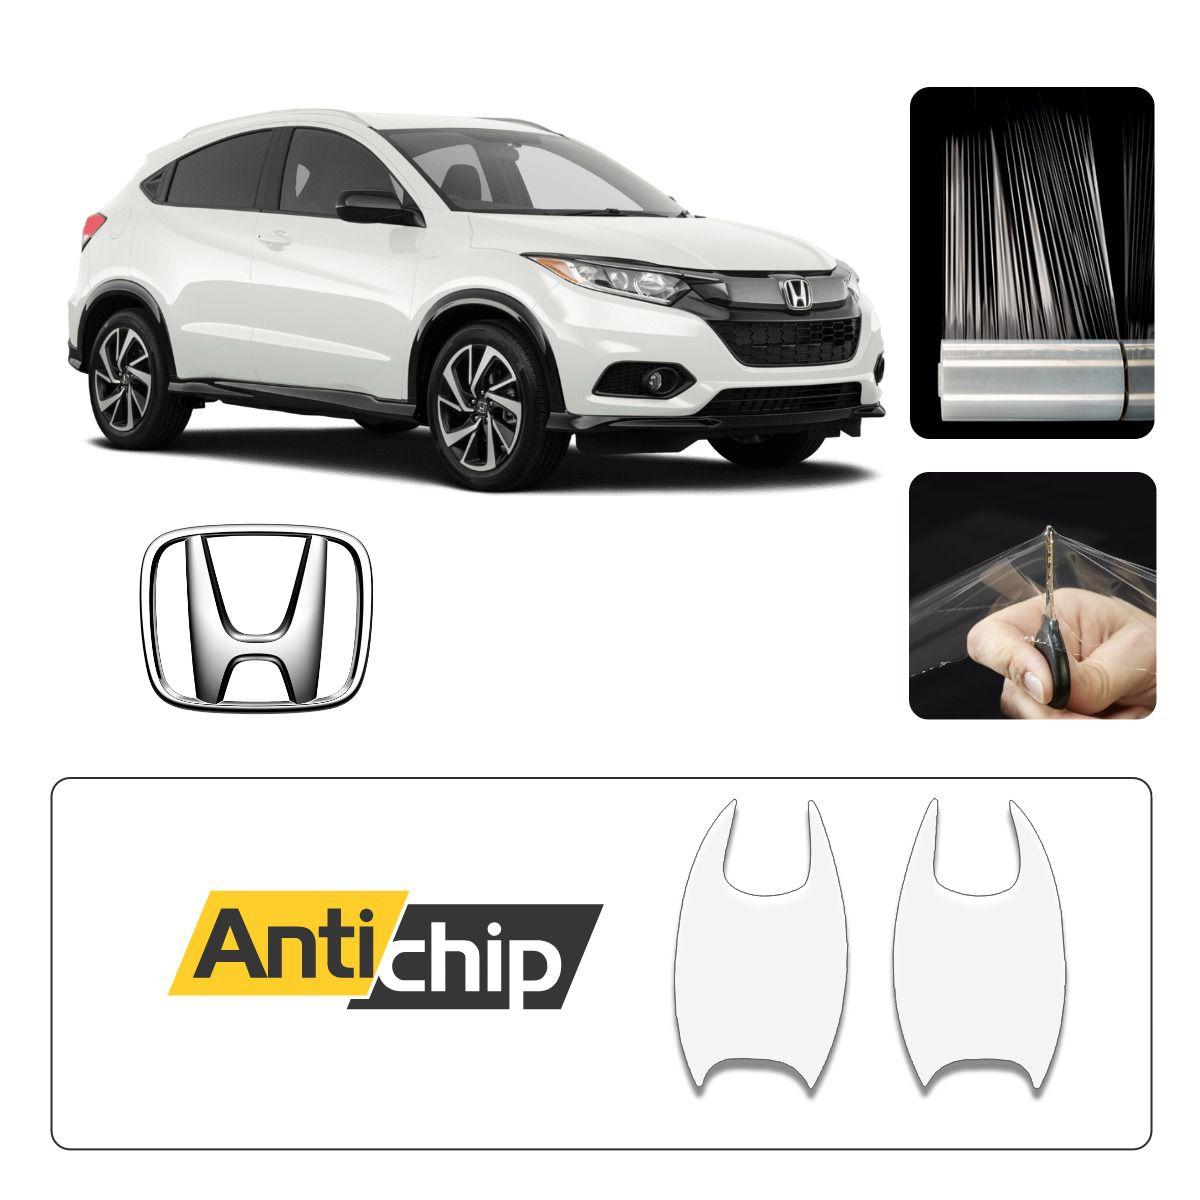 Película Protetora de Pintura Maçaneta Honda HRV - Antichip  - Autoair